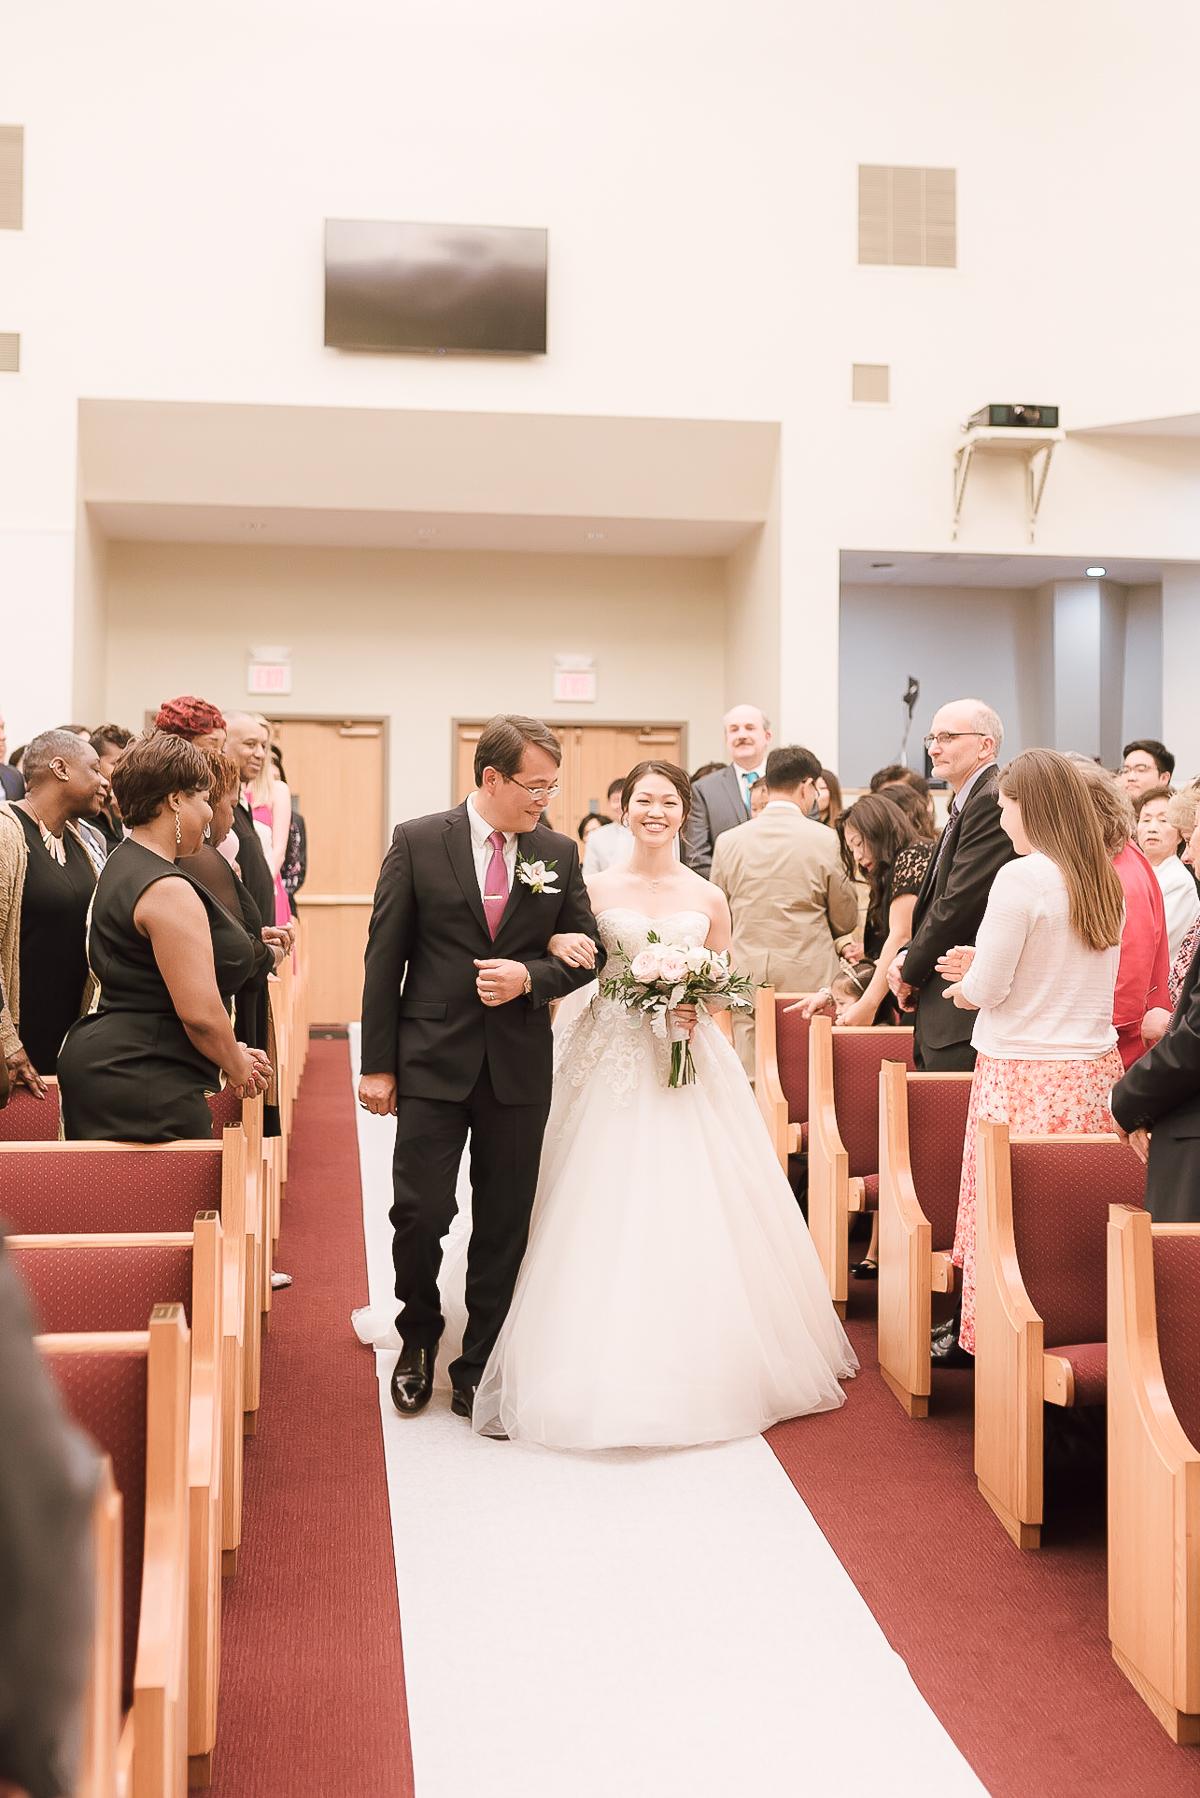 MD-Wedding-Columbia-Inn-Hollywood-Ballroom-Bridal-Party-47.jpg